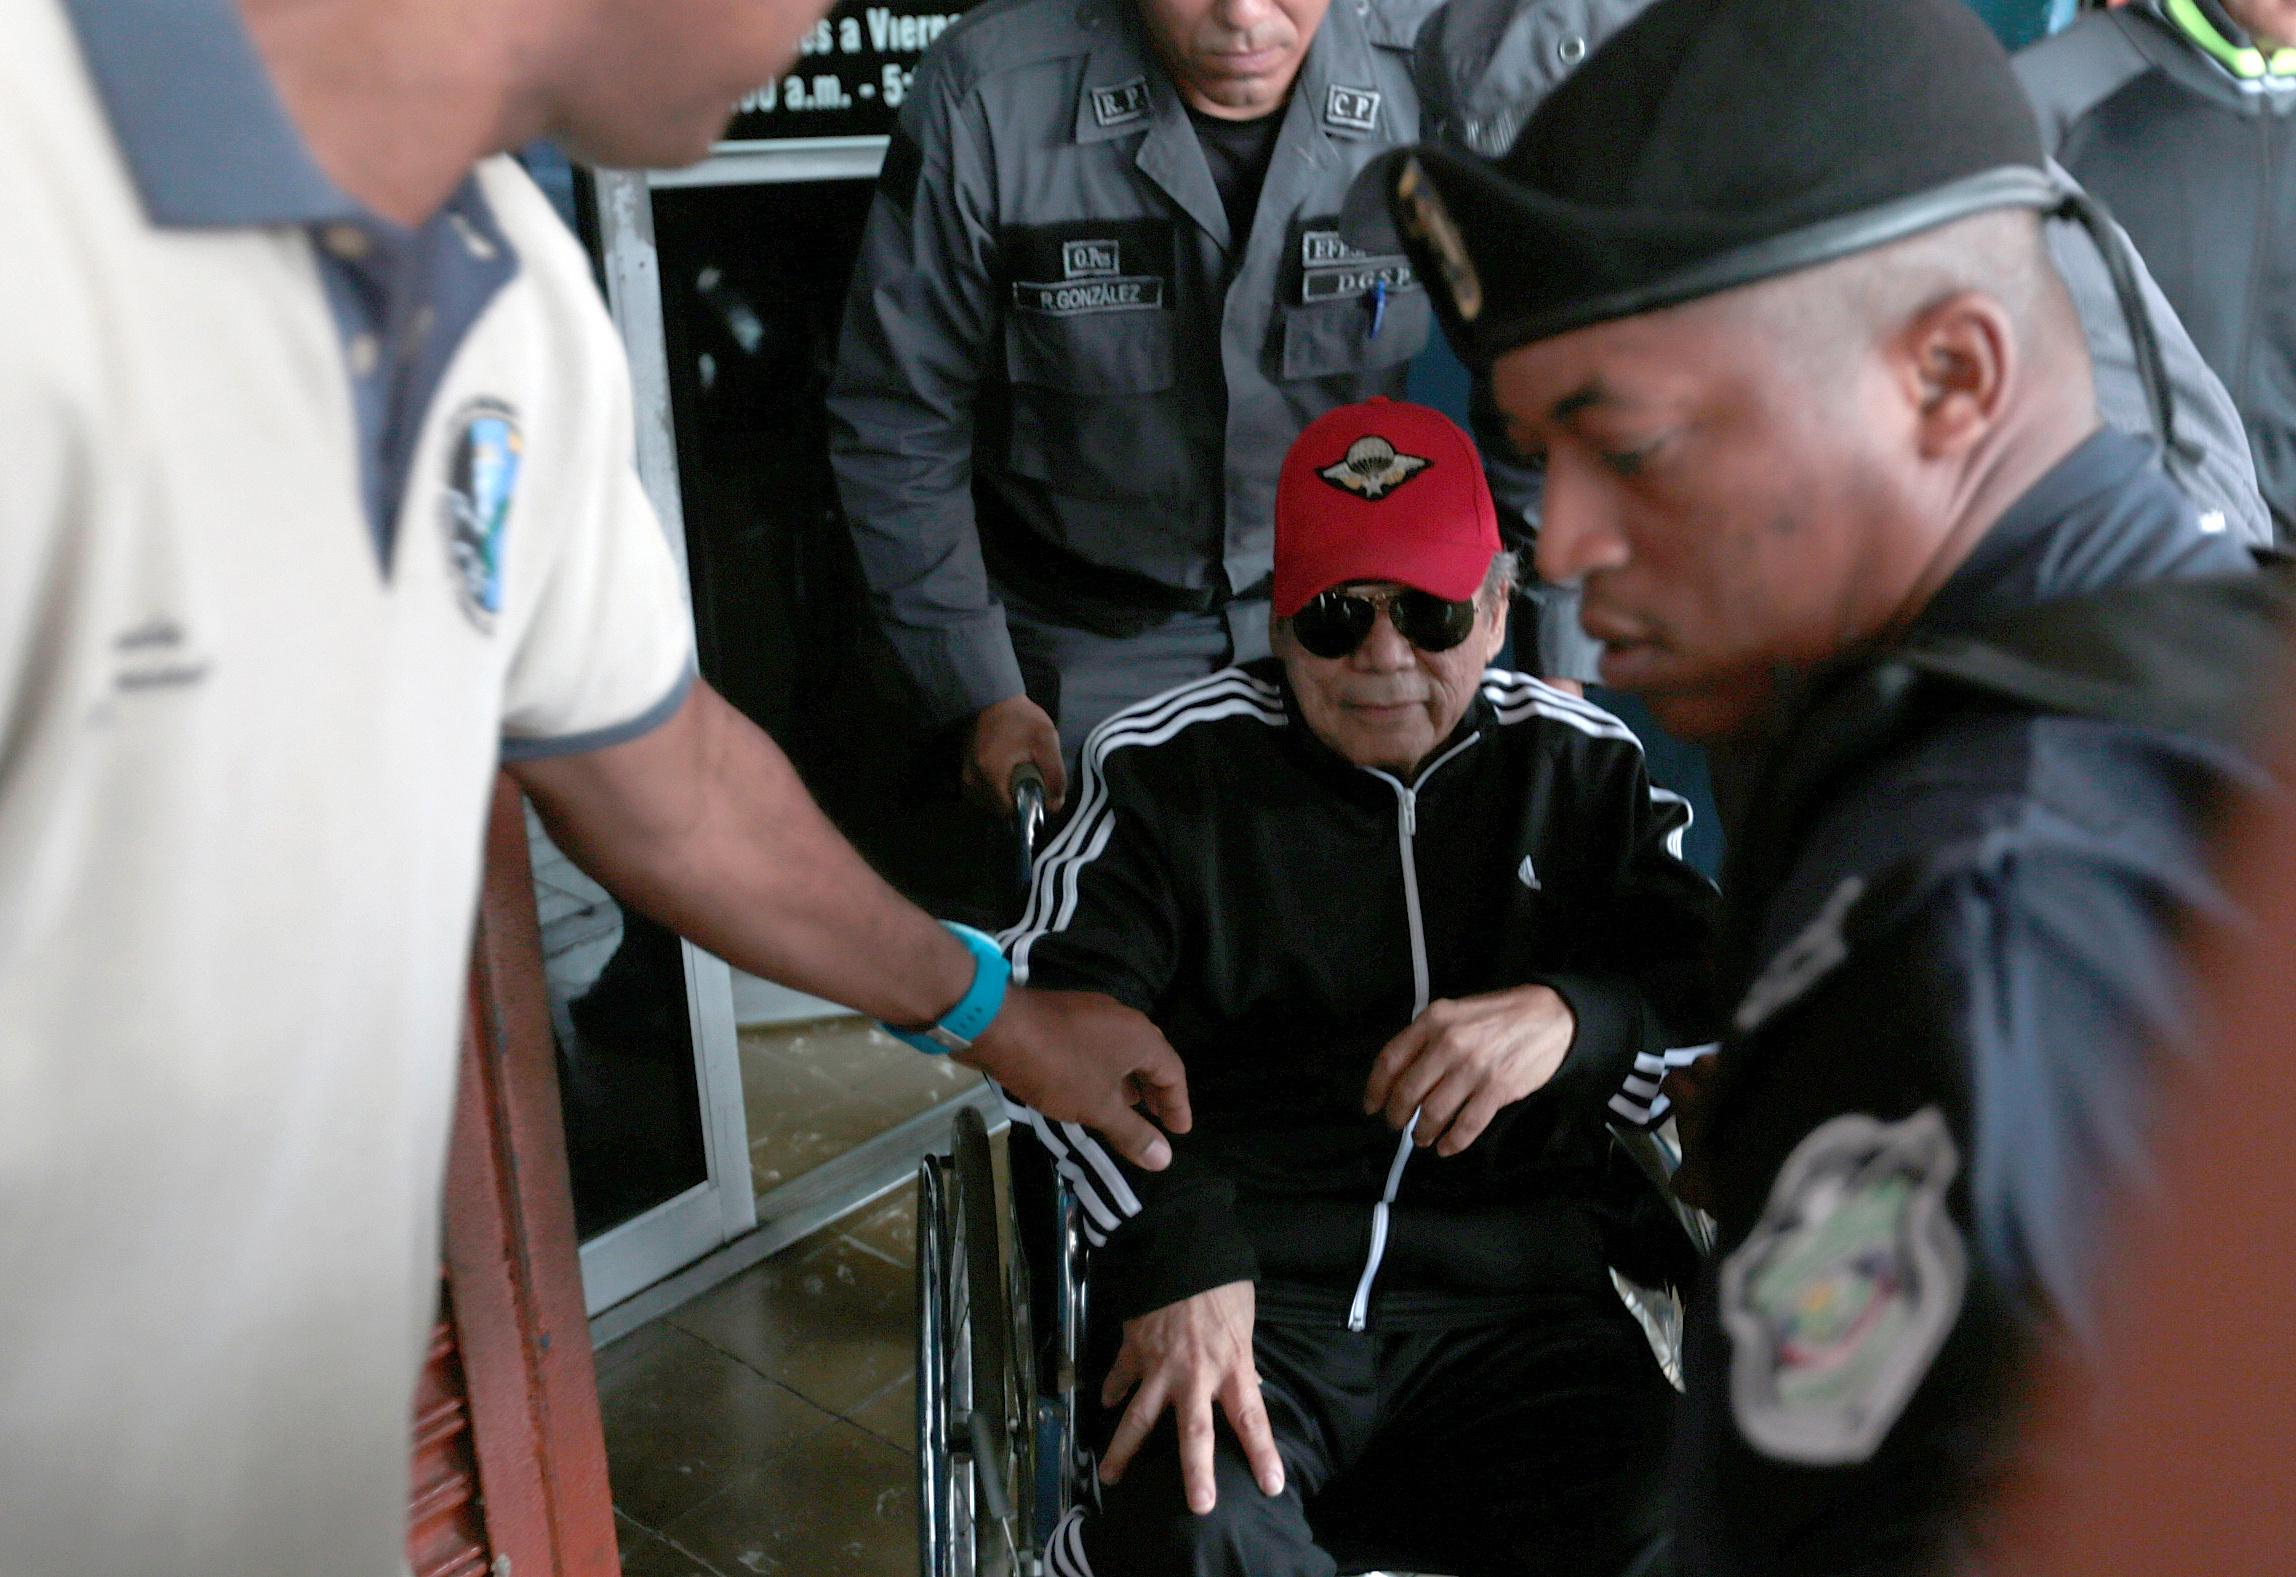 manuel noriega expanama dictator and cia informant